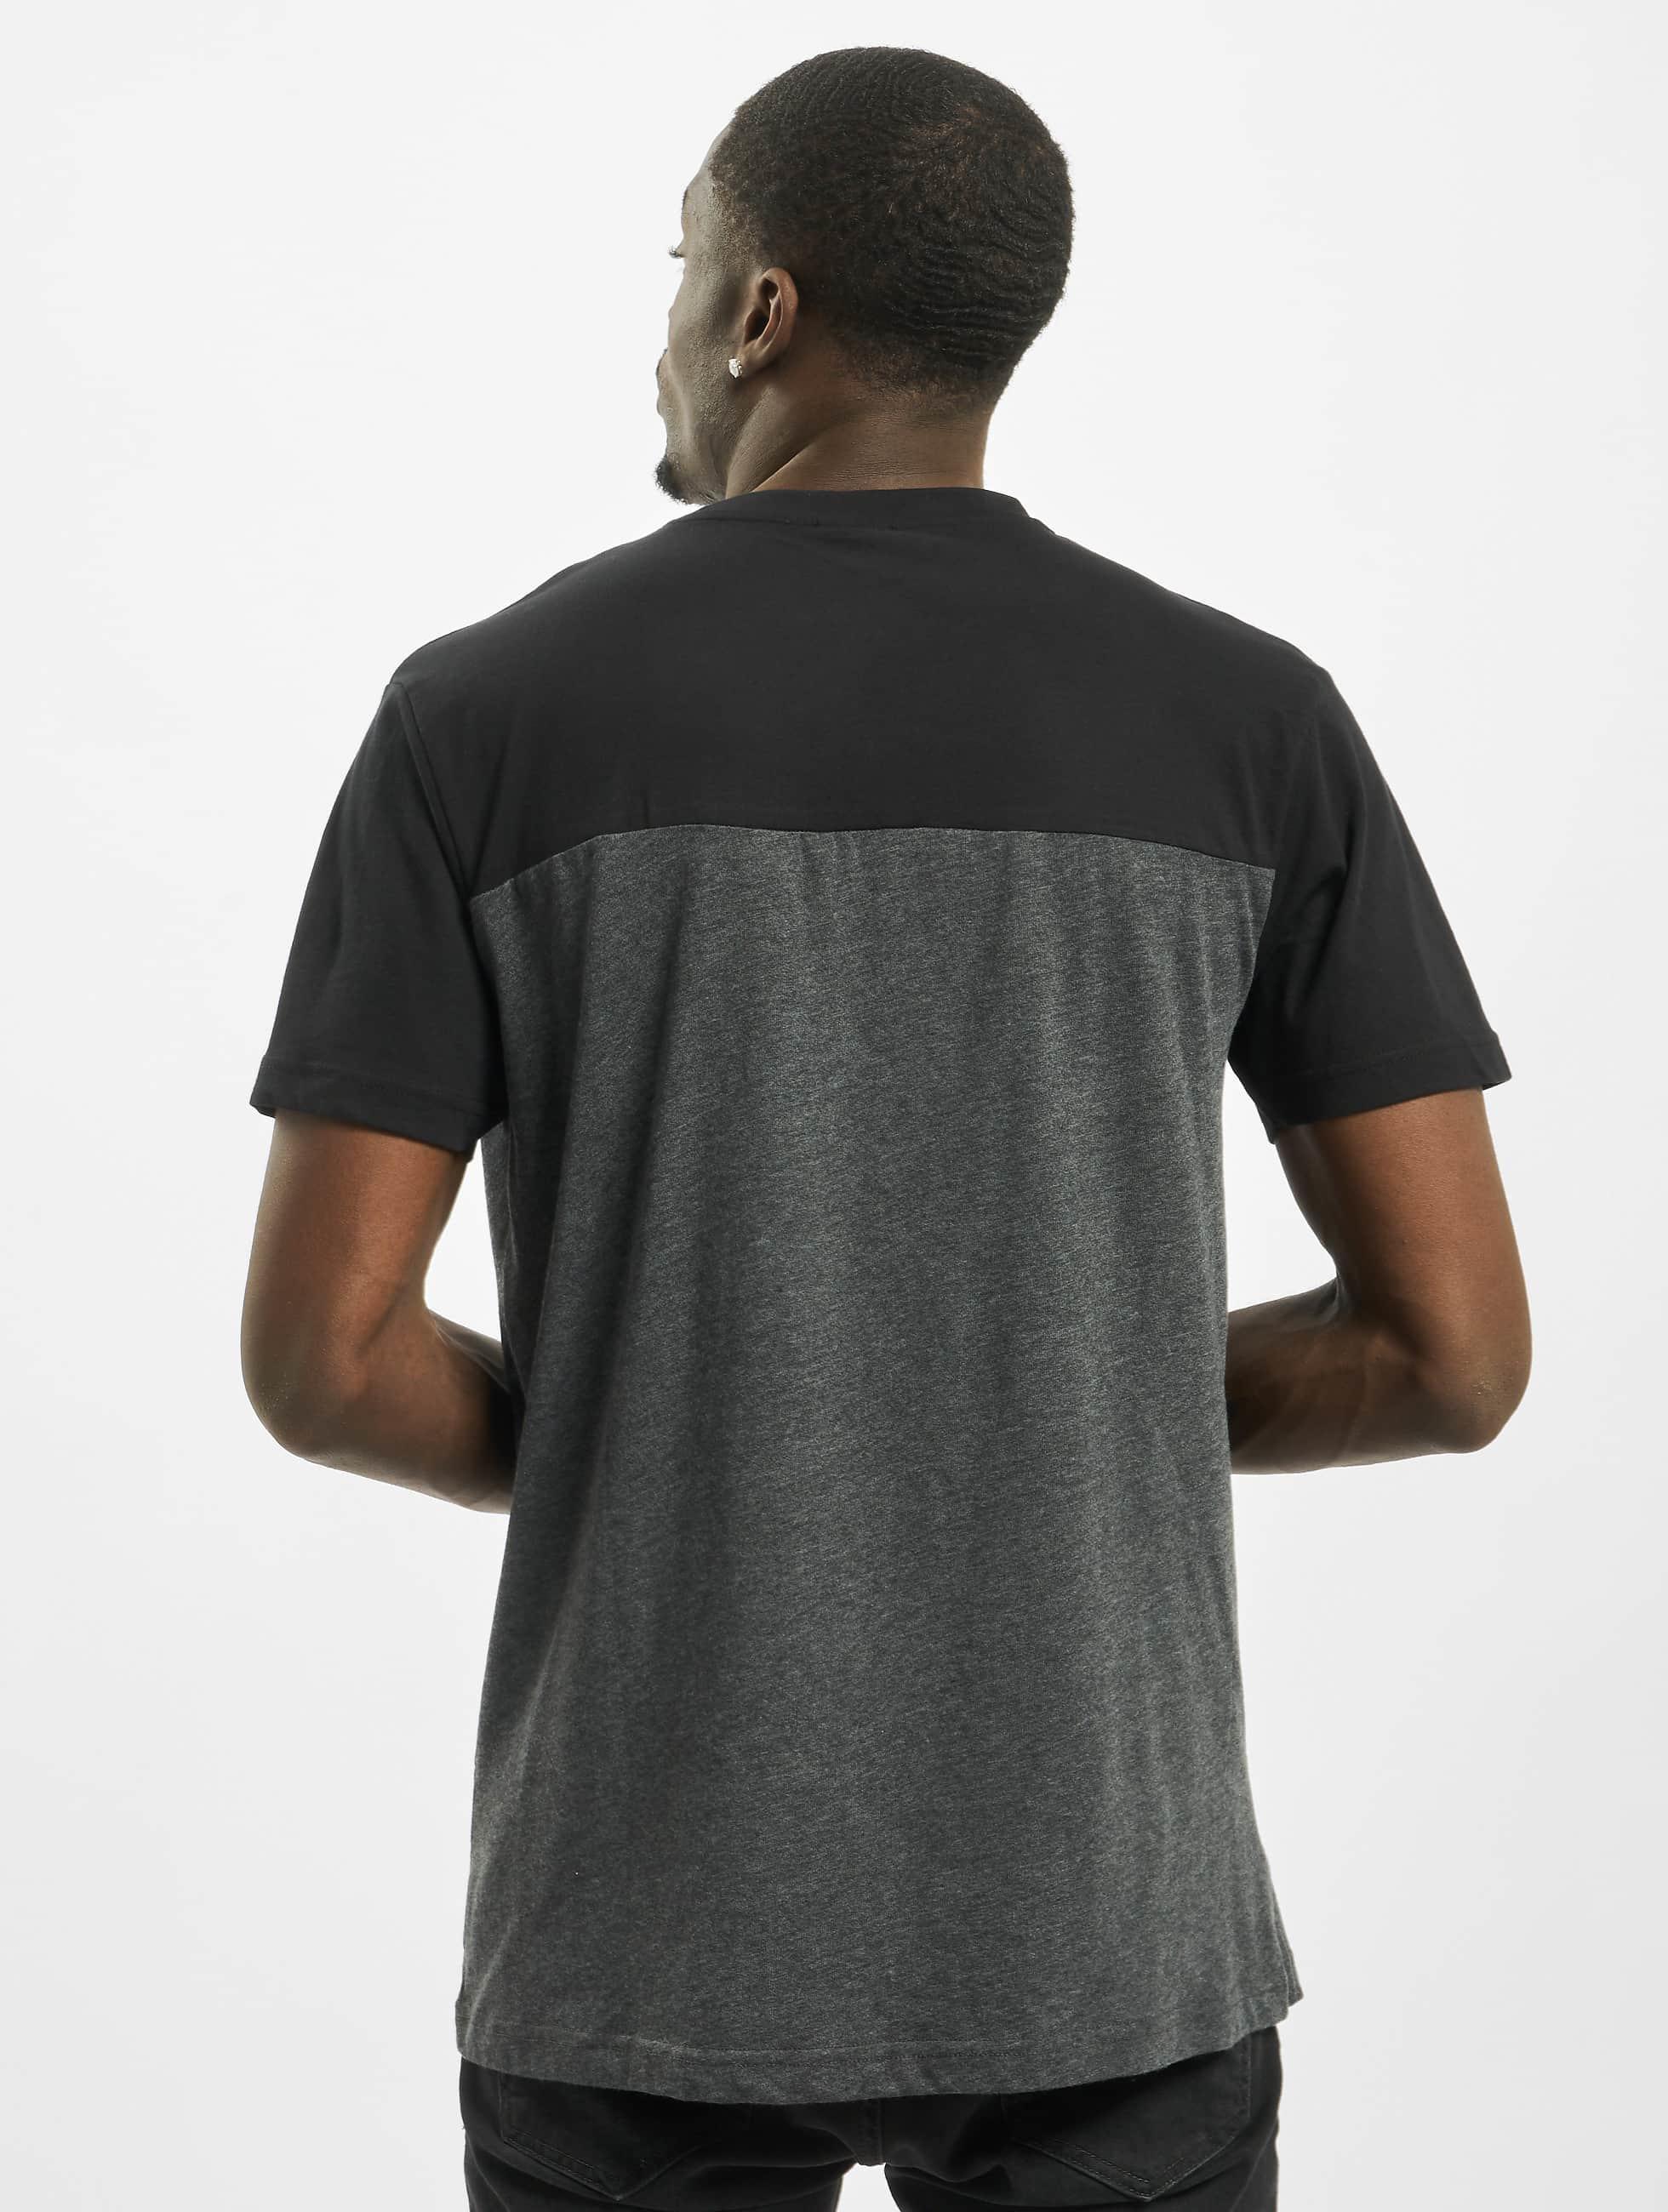 Urban-Classics-Uomini-Maglieria-T-shirt-3-Tone-Pocket